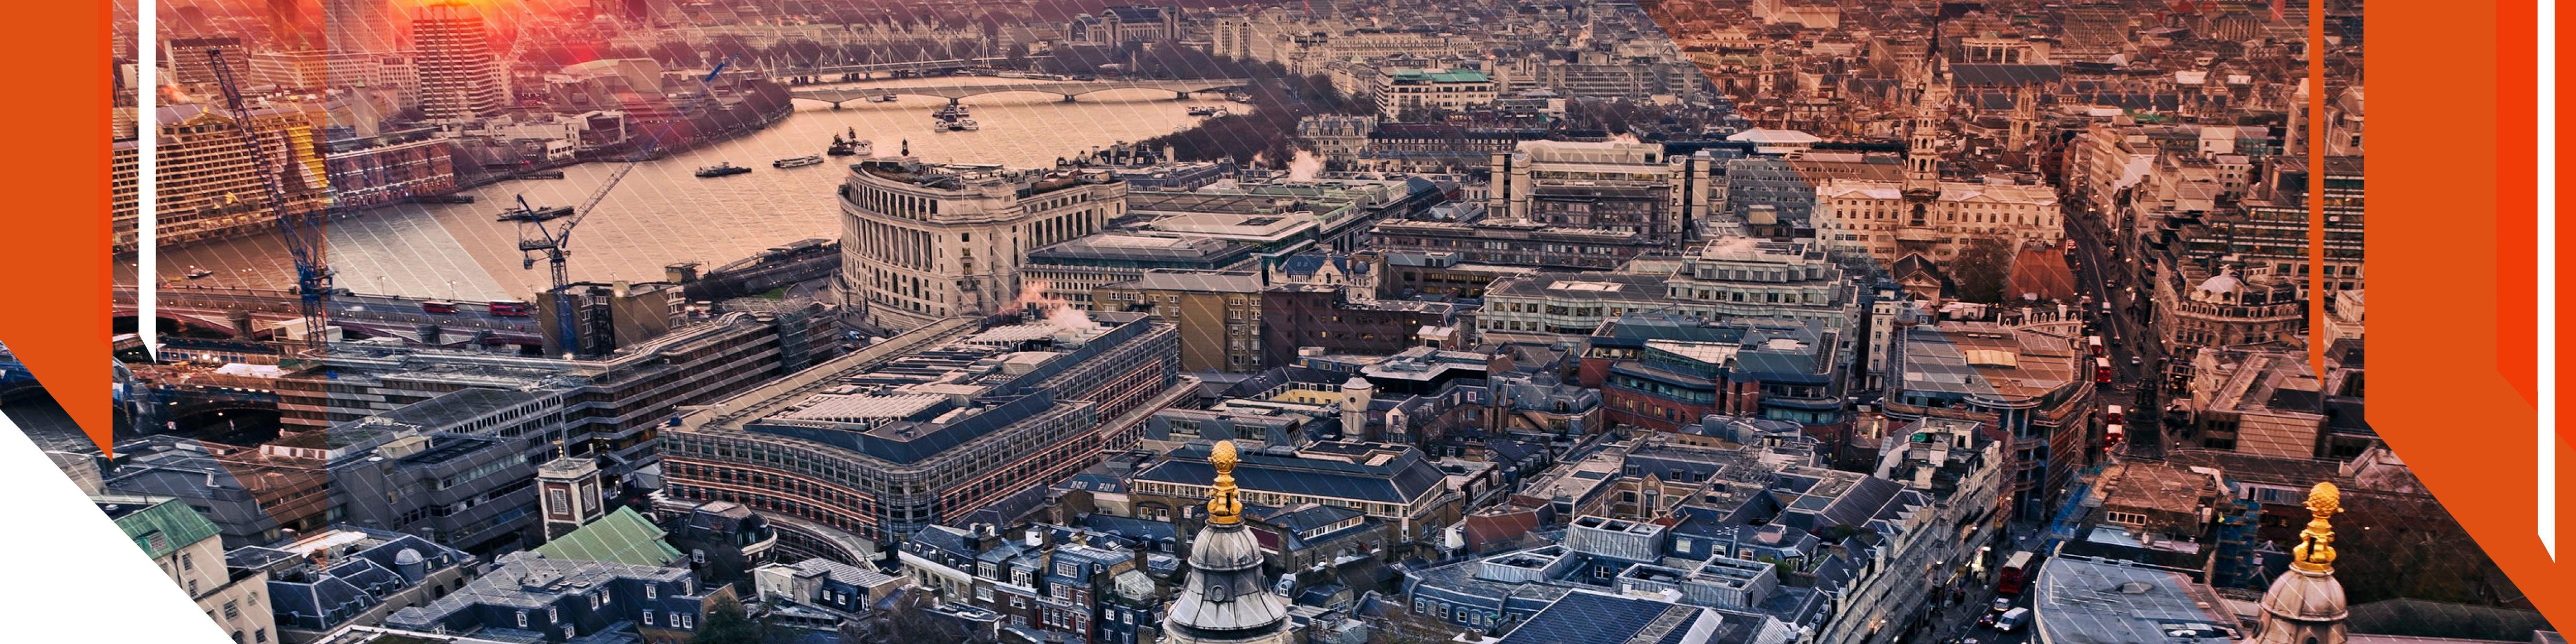 London City Skyline View